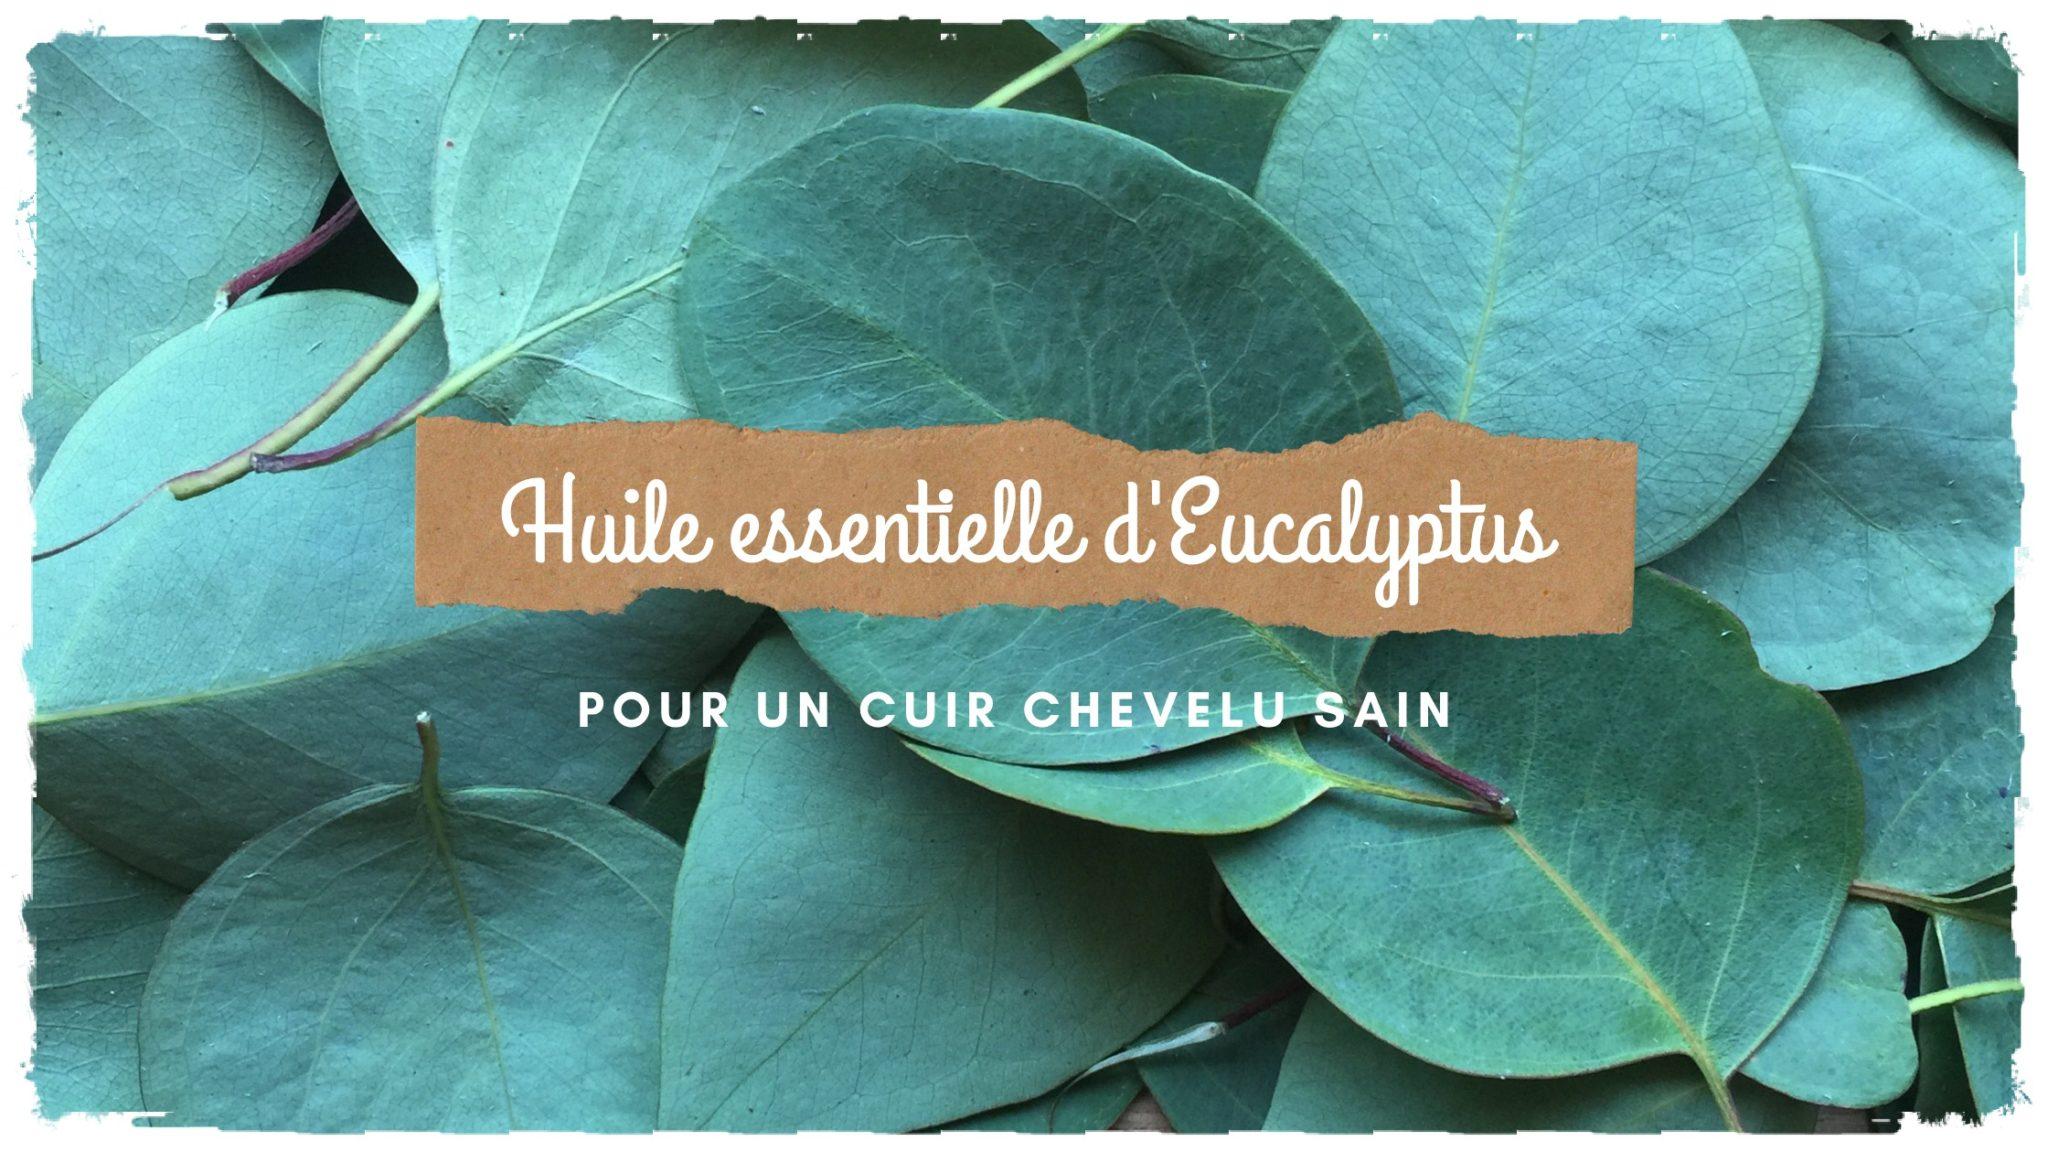 You are currently viewing Obtenir un cuir chevelu sain avec l'huile essentielle d'Eucalyptus